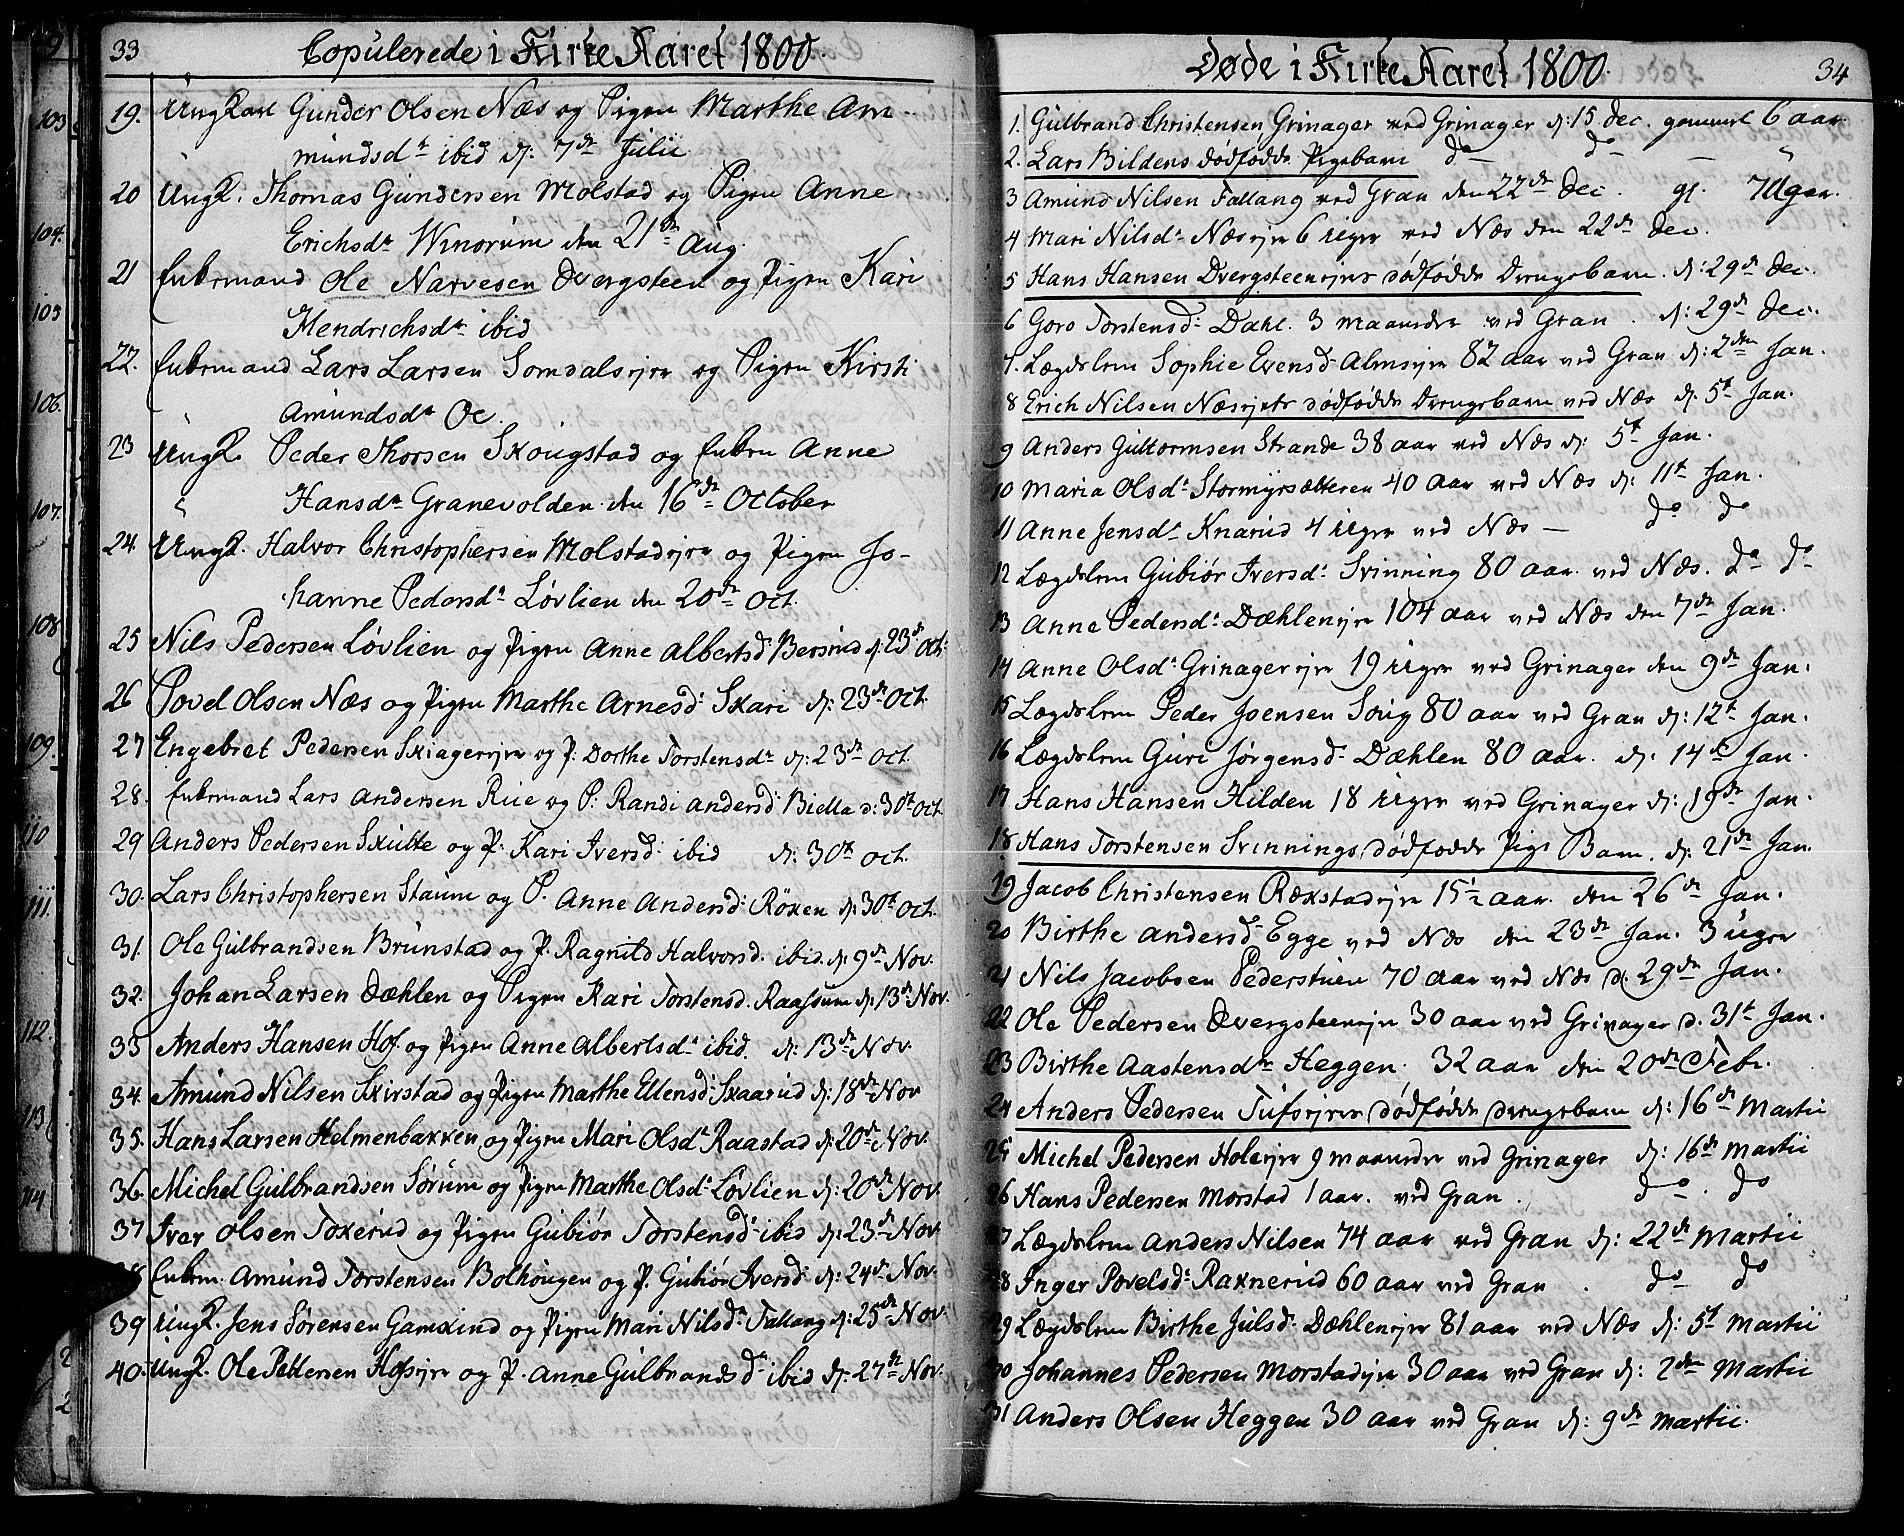 SAH, Gran prestekontor, Parish register (official) no. 8, 1798-1811, p. 33-34